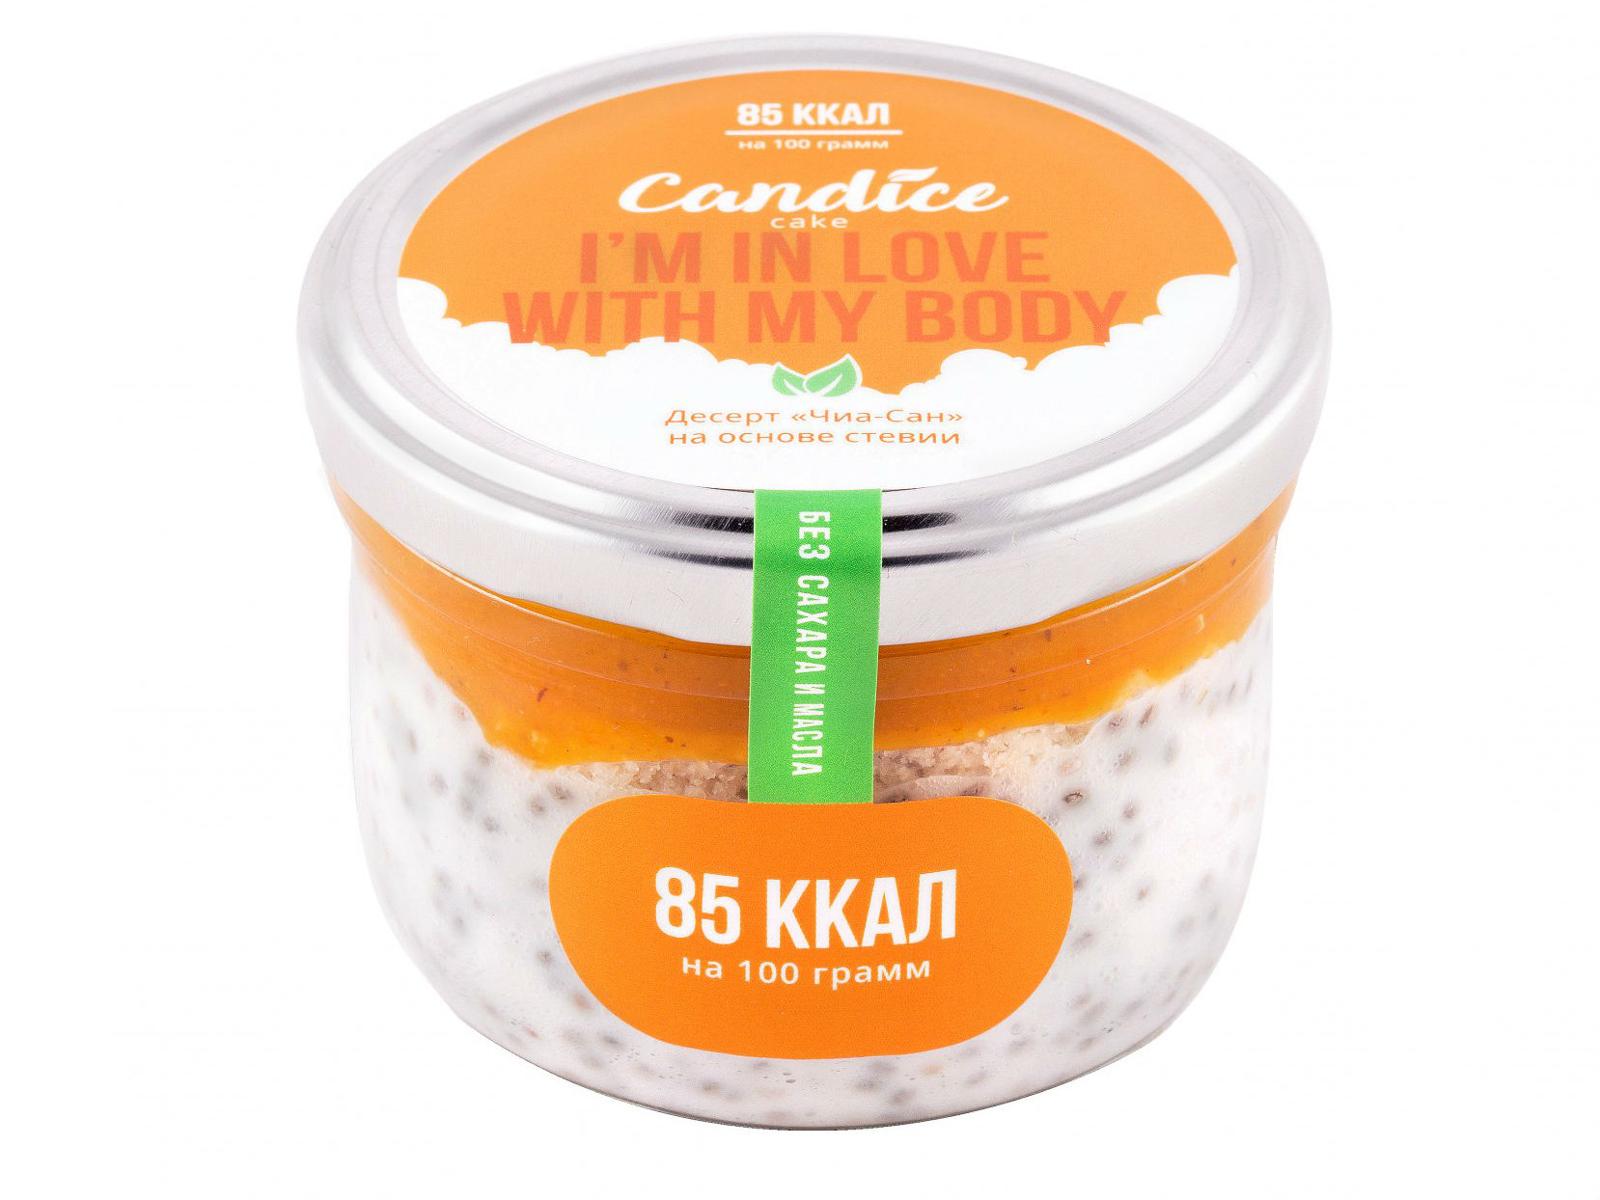 Candice Cake Чиа-сан